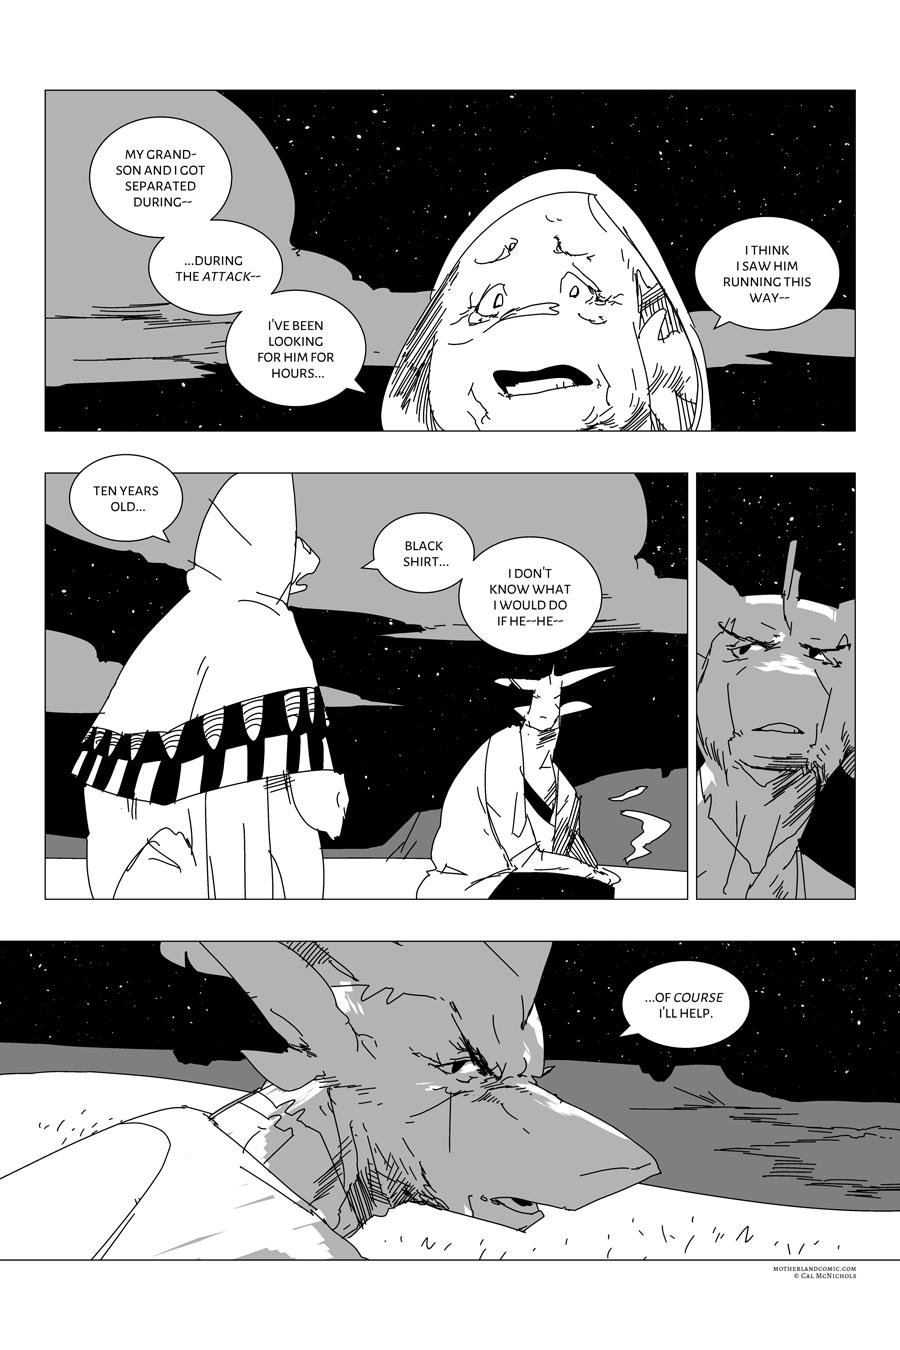 pg 117